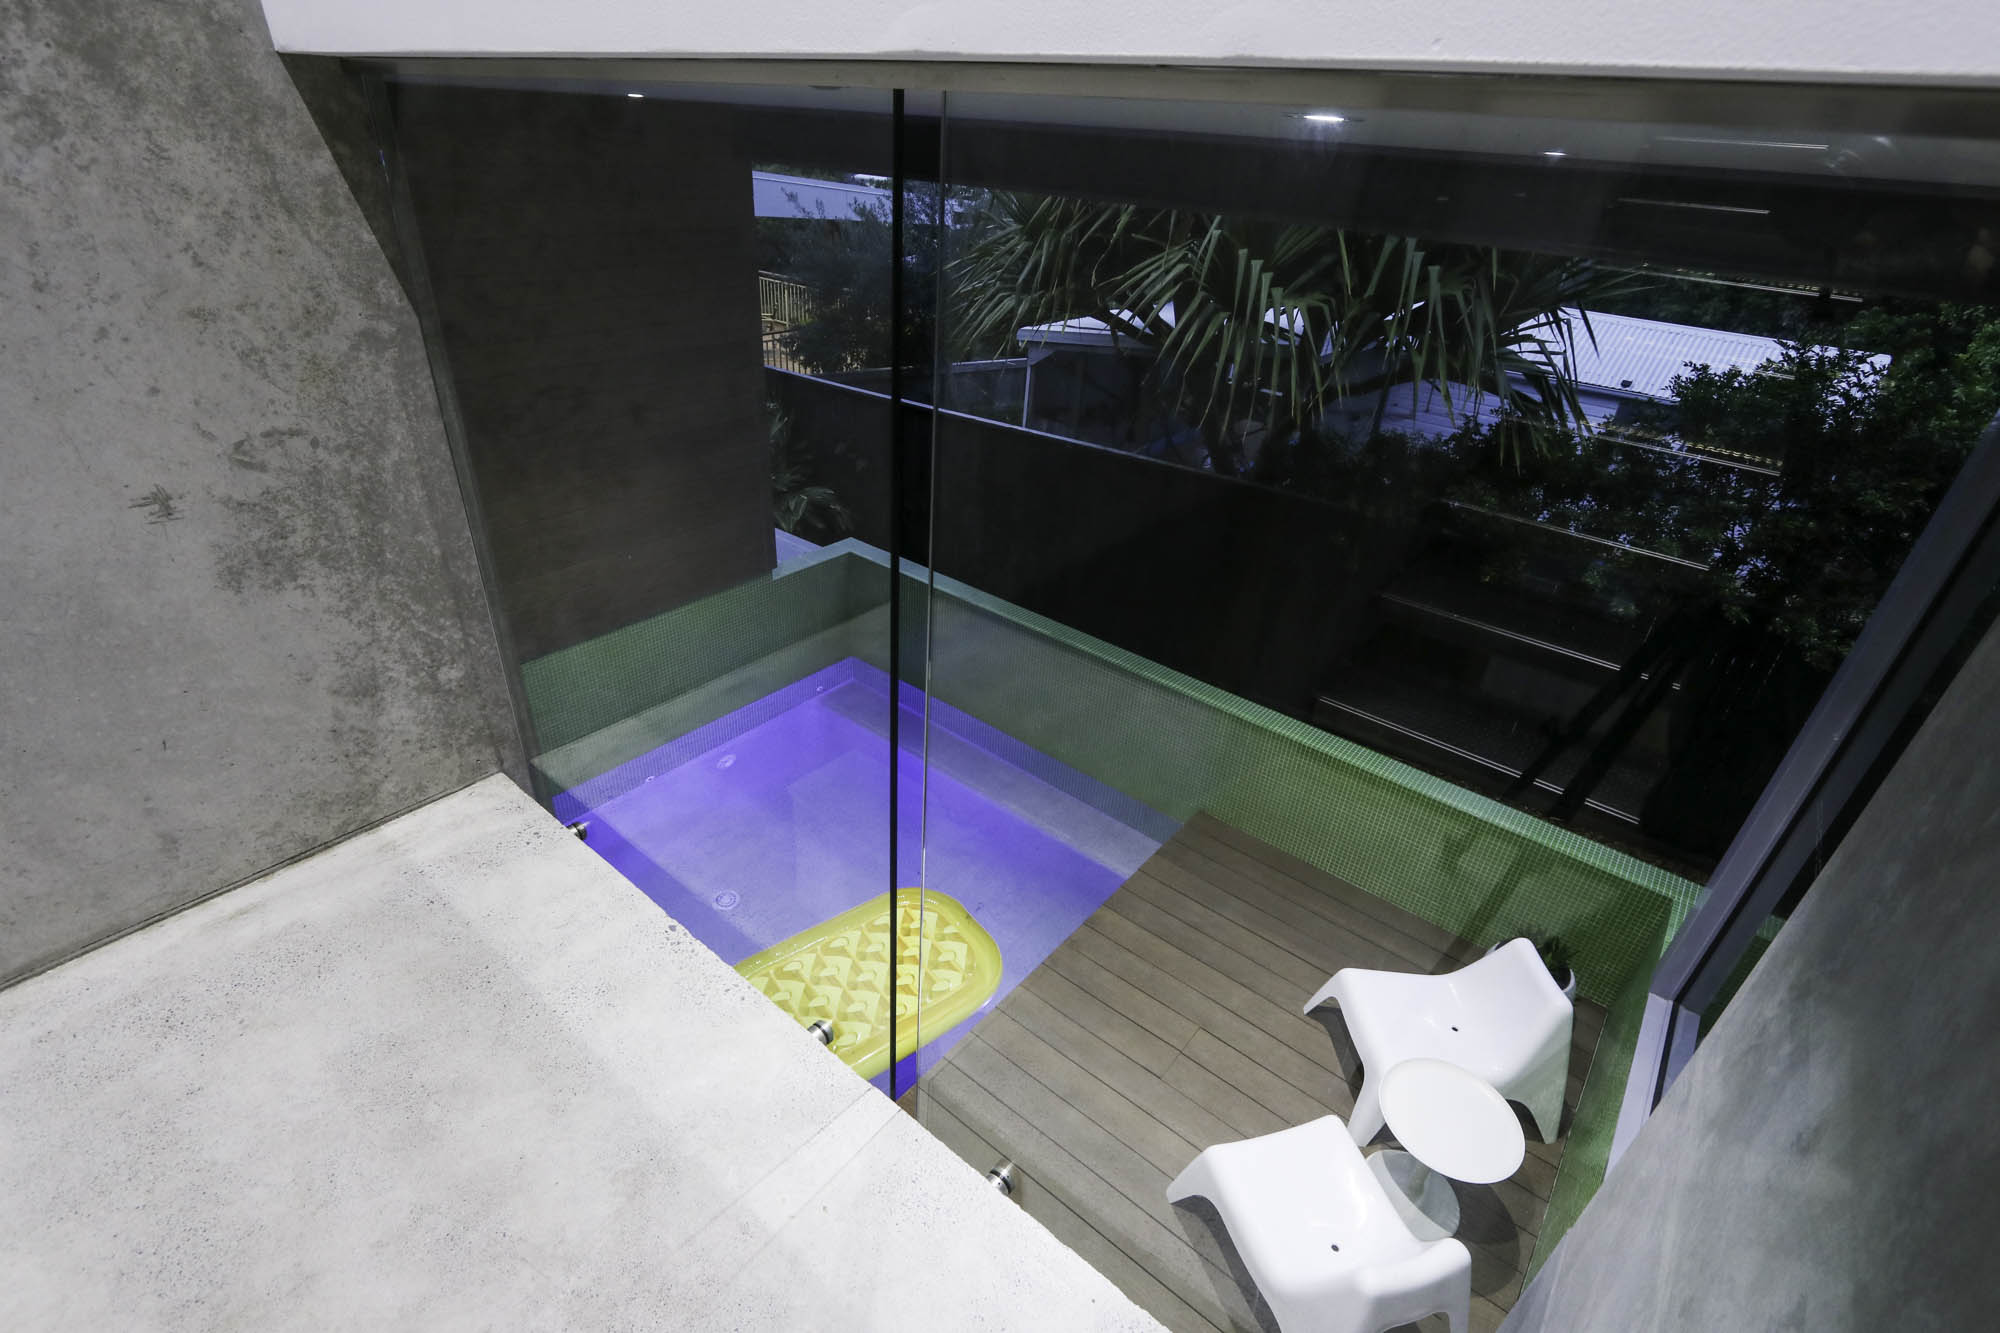 slater pool deck